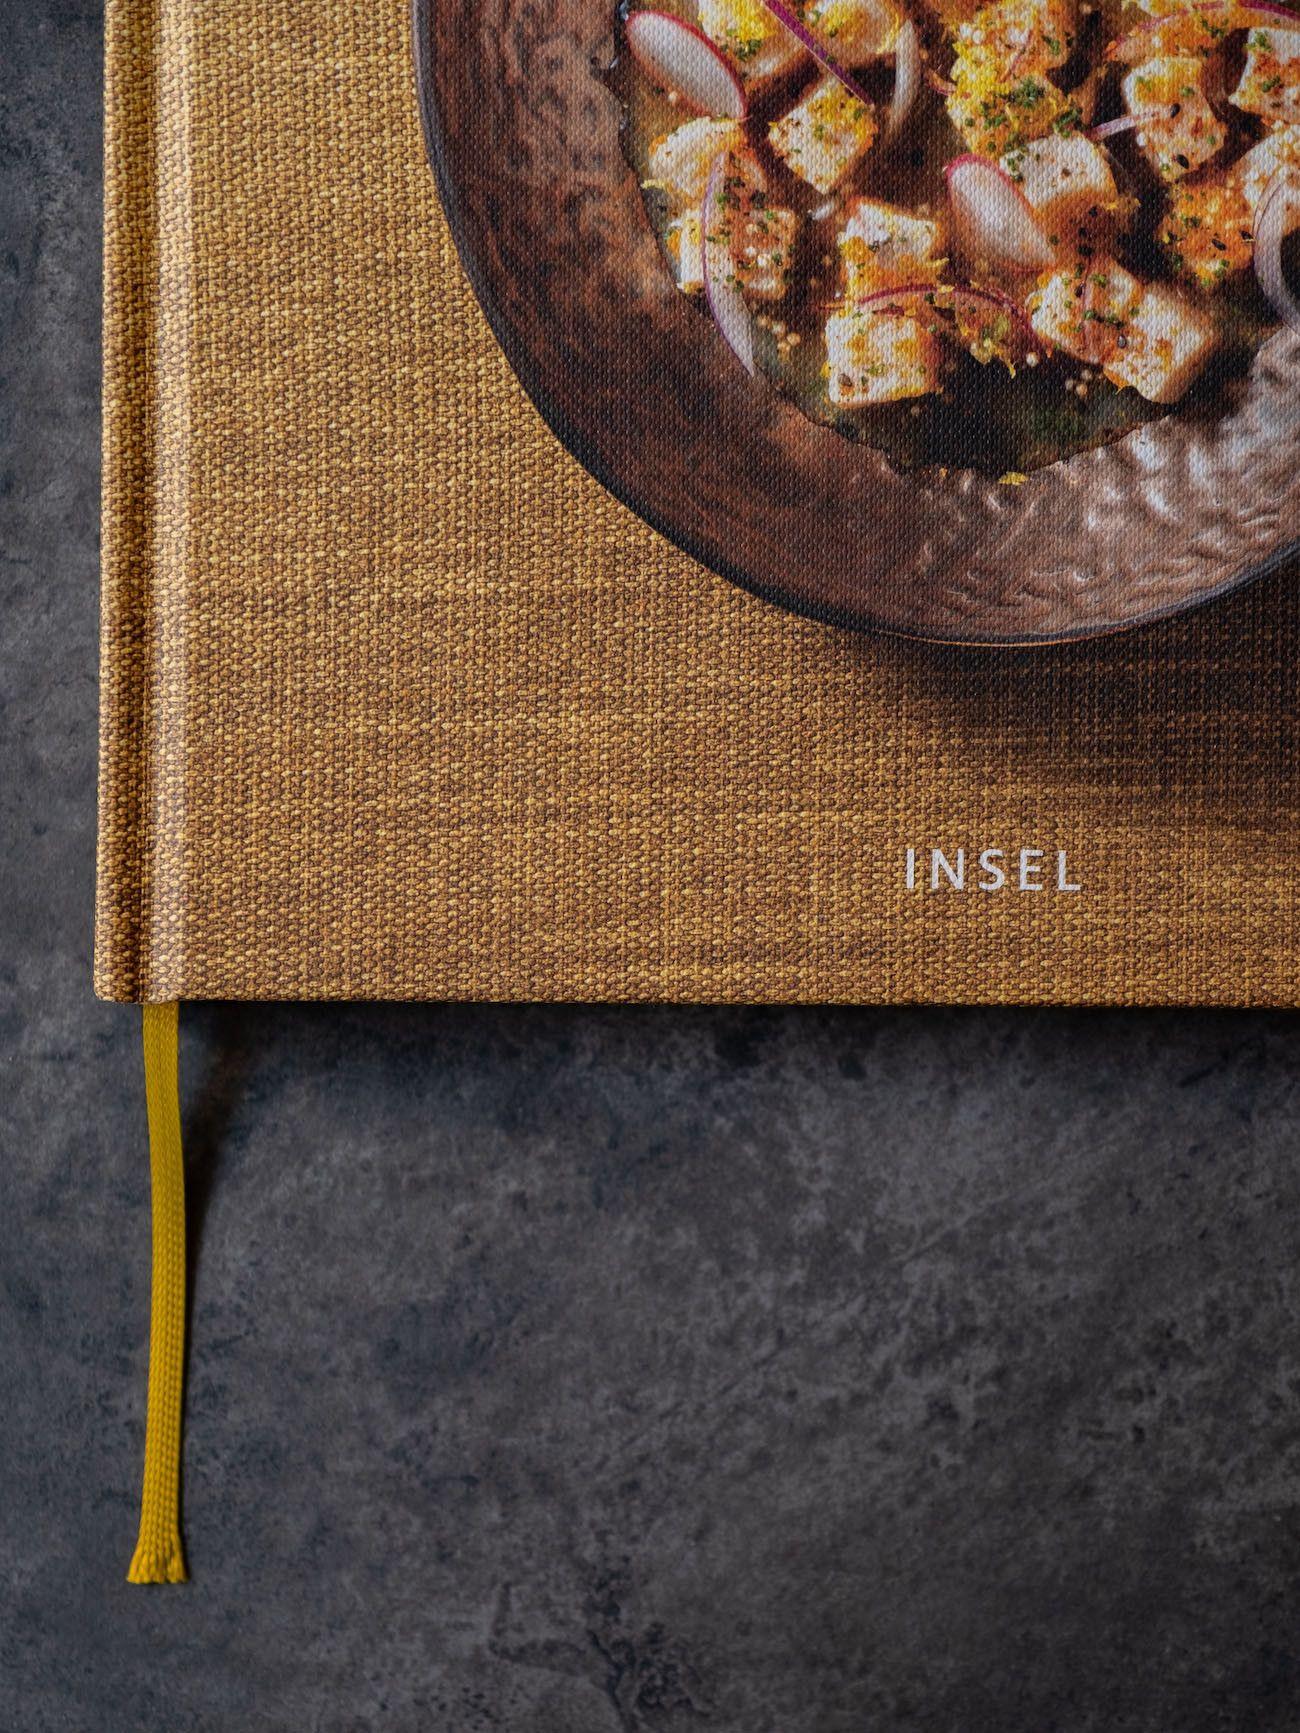 Foodblog, About Fuel, CEVICHE Das Kochbuch, Juan Danilo, Buchcover, Detail, Insel Verlag